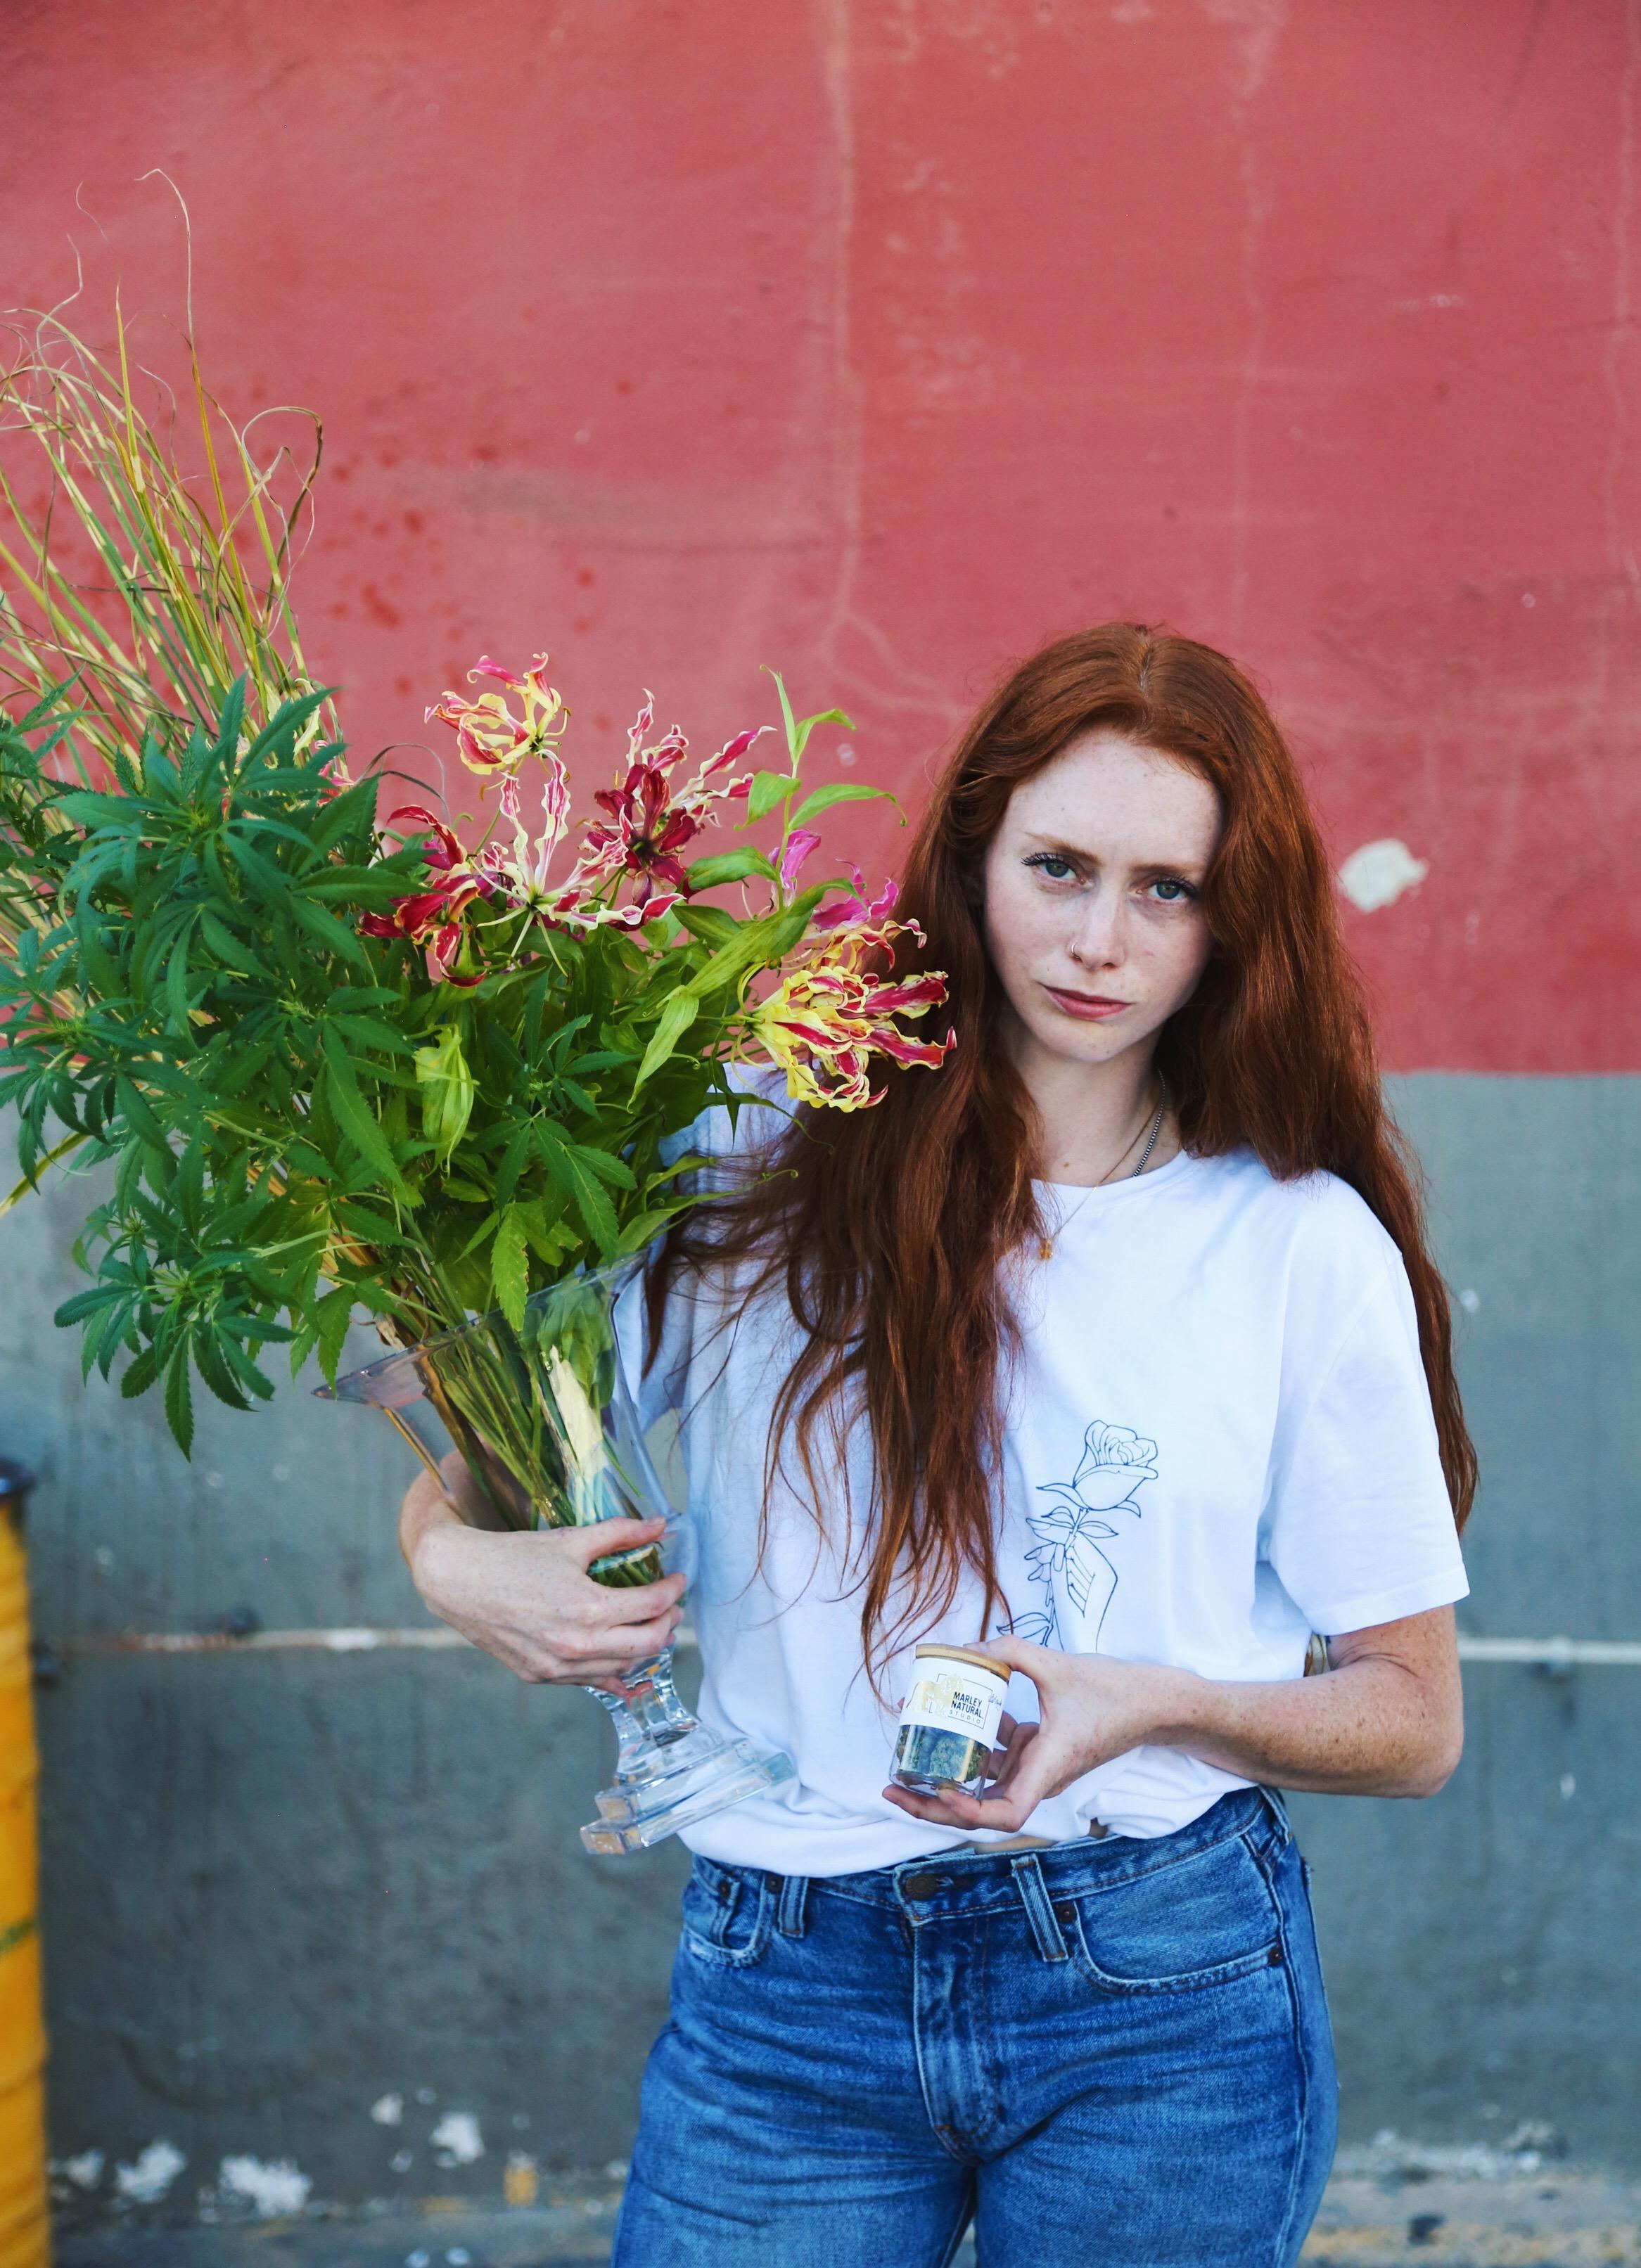 Marley_Natural_SarahLineburger_Flower.JPG